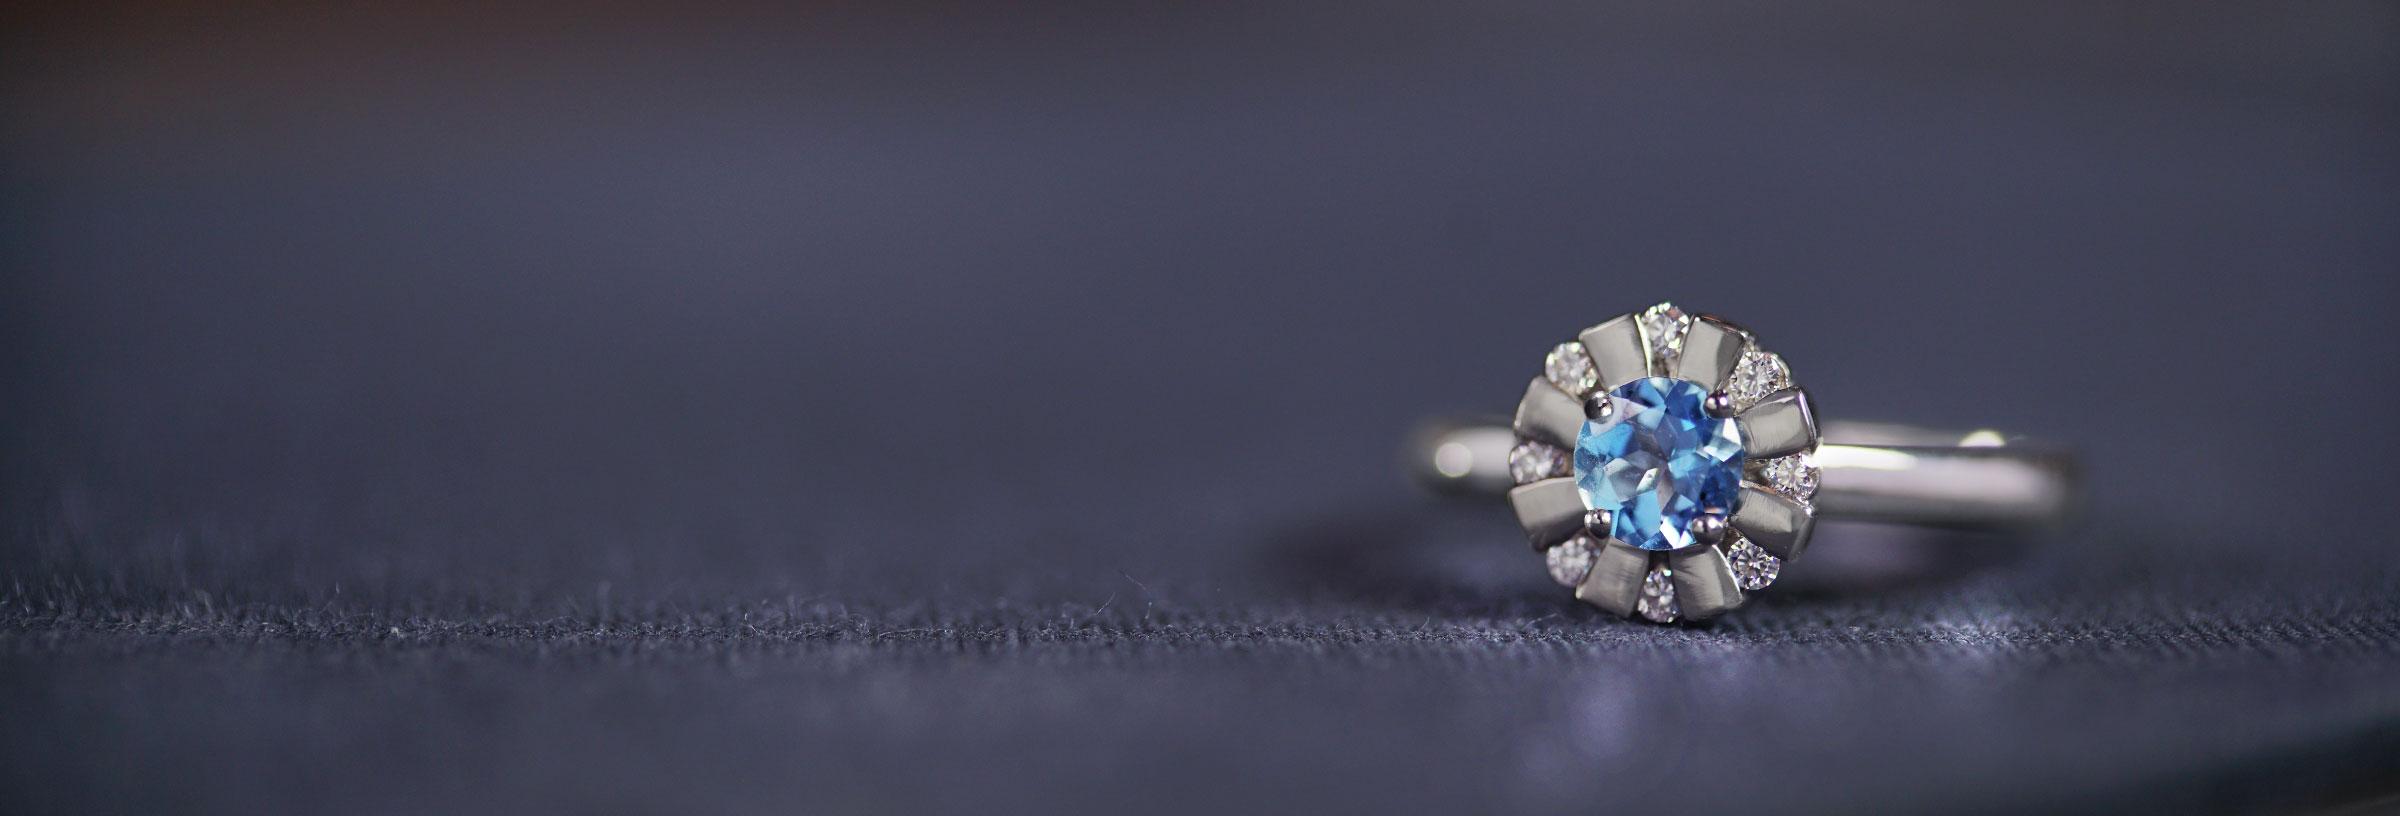 platinum-engagement-ring-with-aquamarine-centre-and-diamond-halo